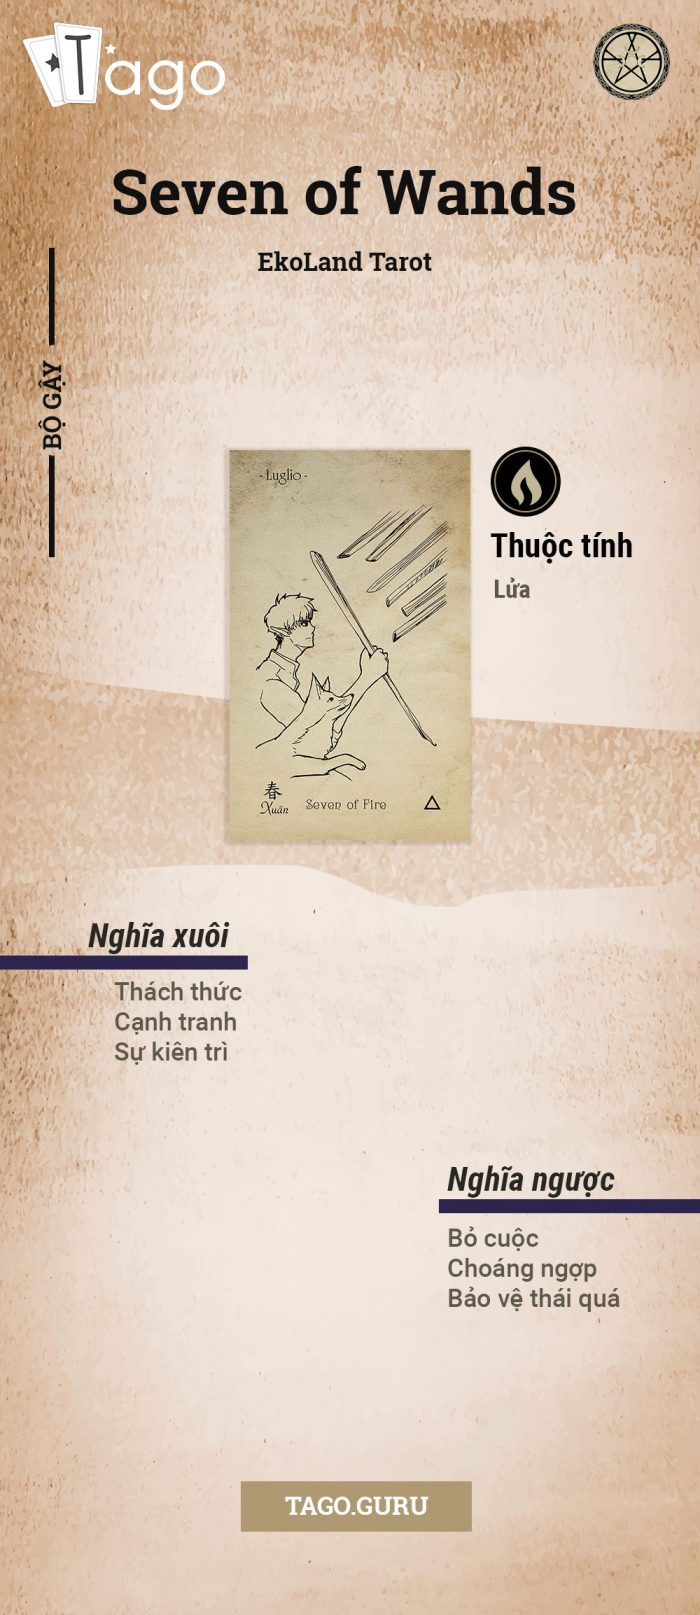 TAGO-Info-Bai-Tarot-Seven-of-wands